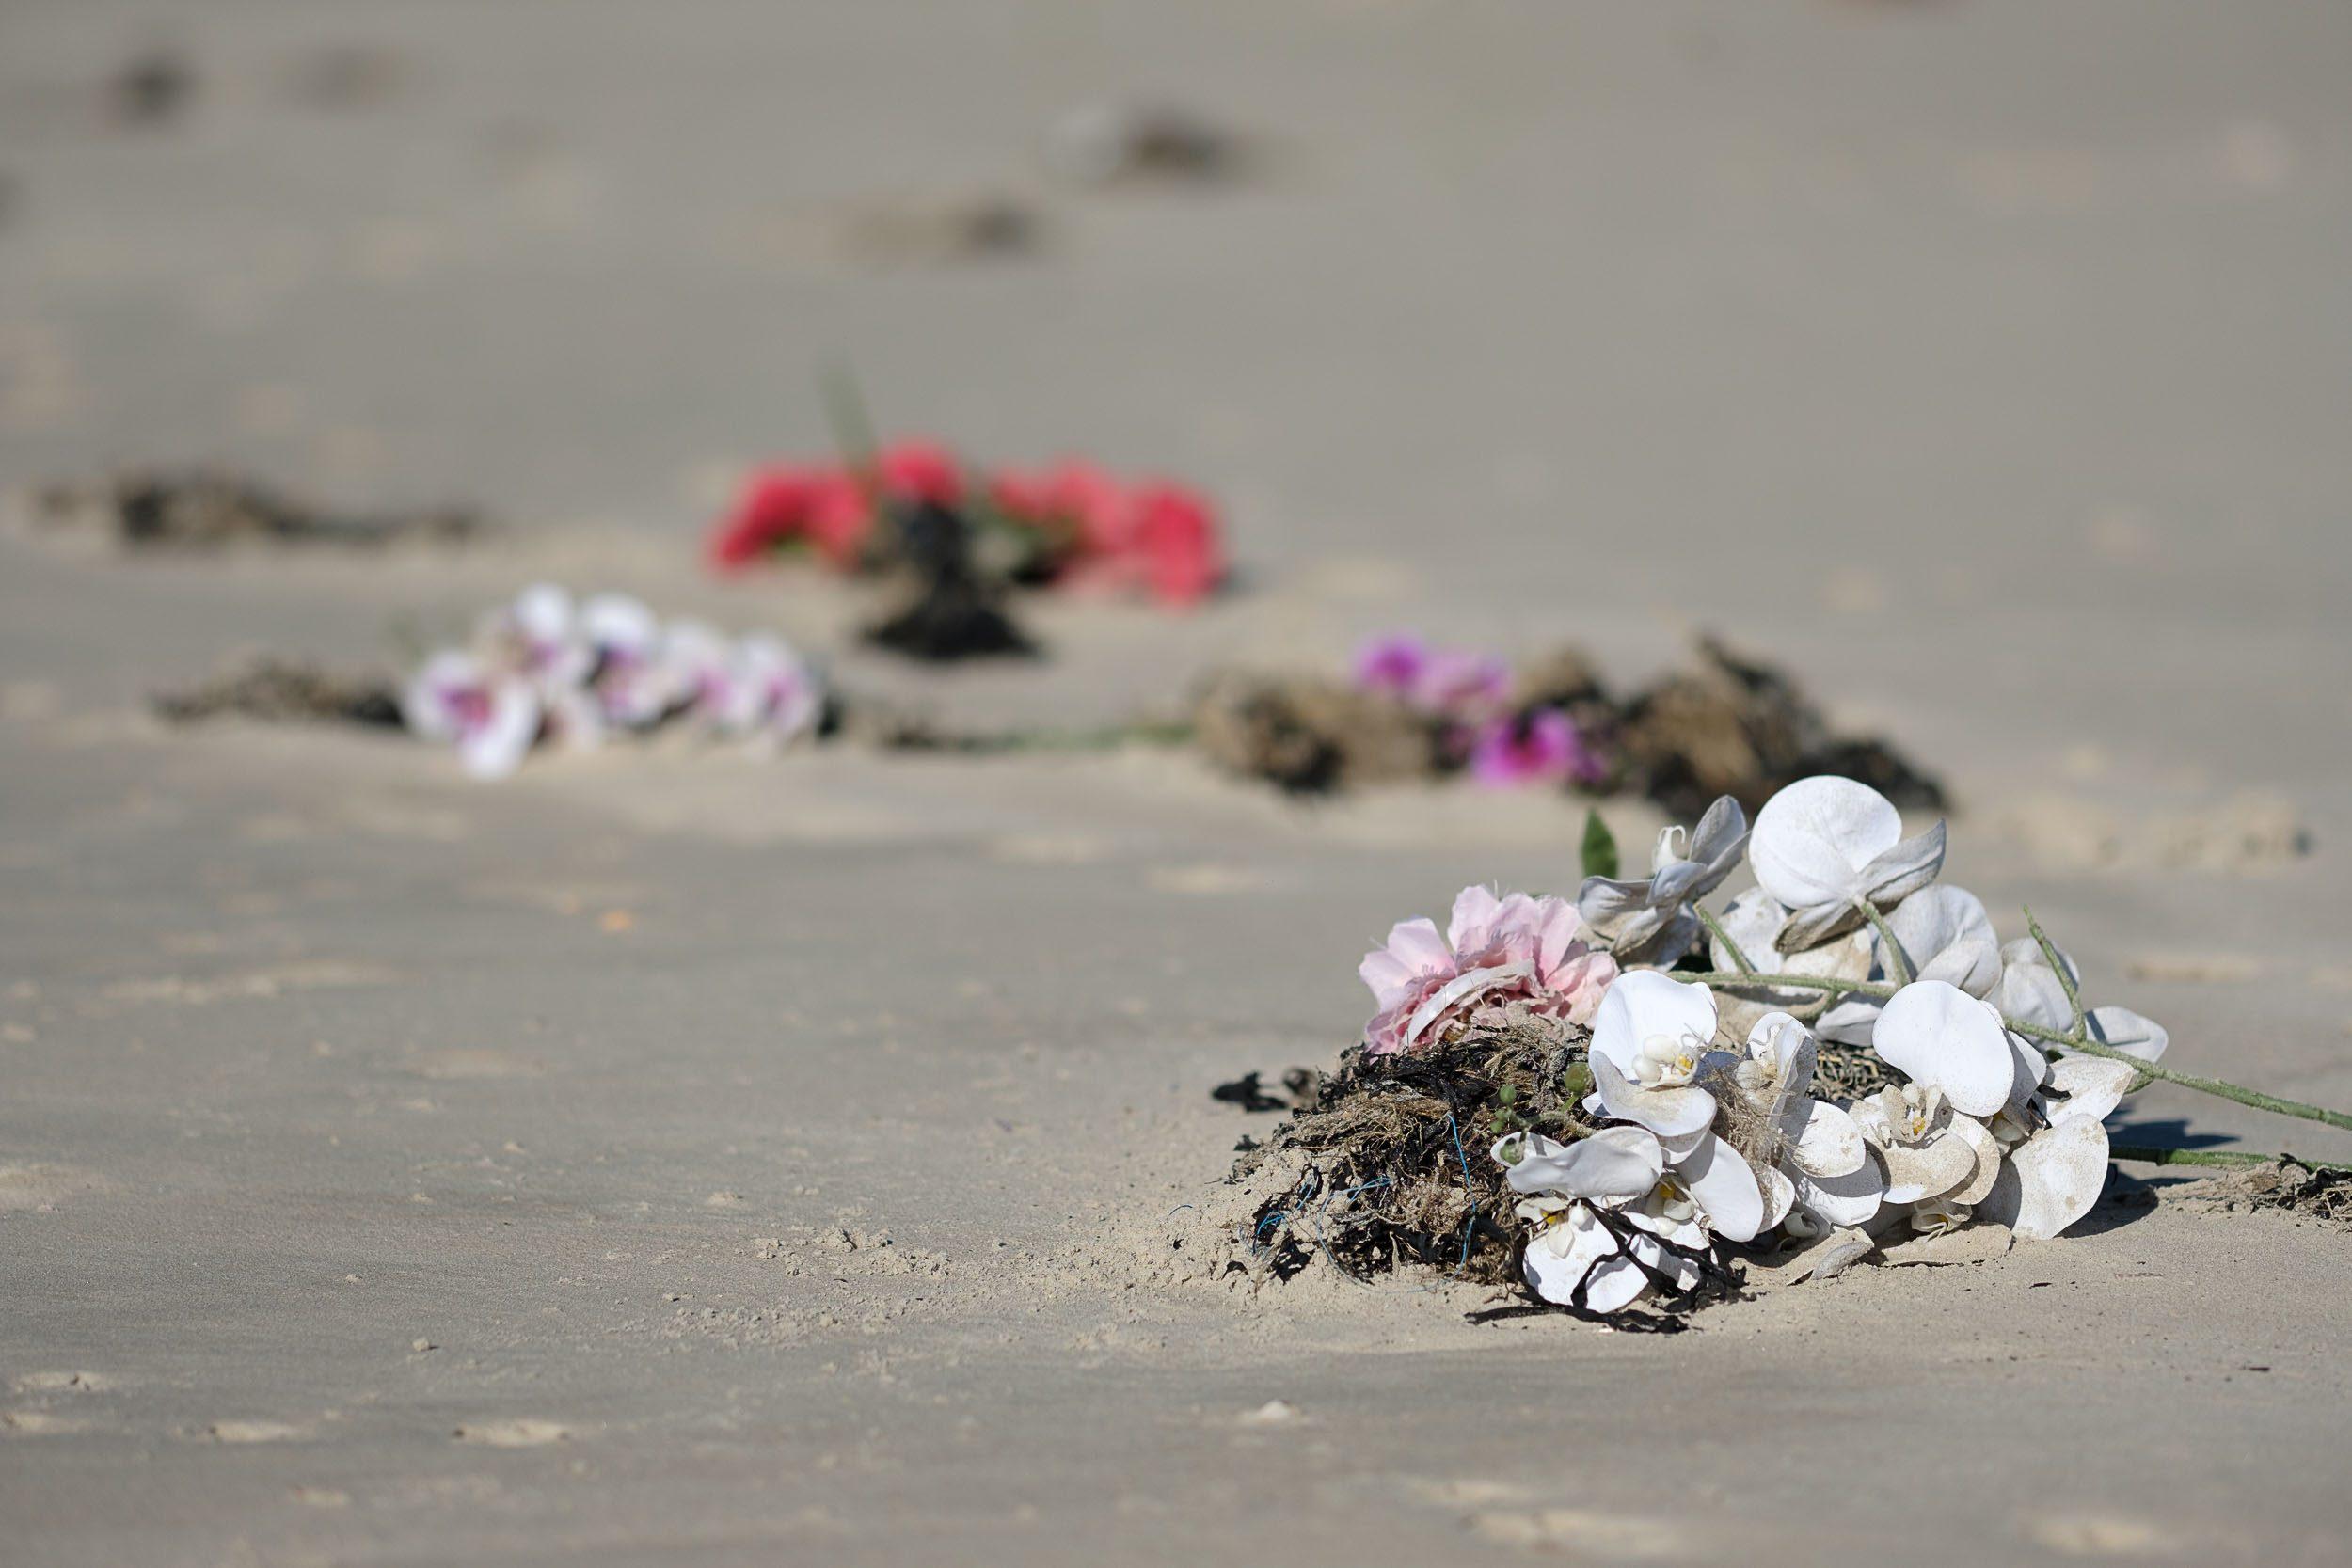 Plastikblumen am Strand, Norderney